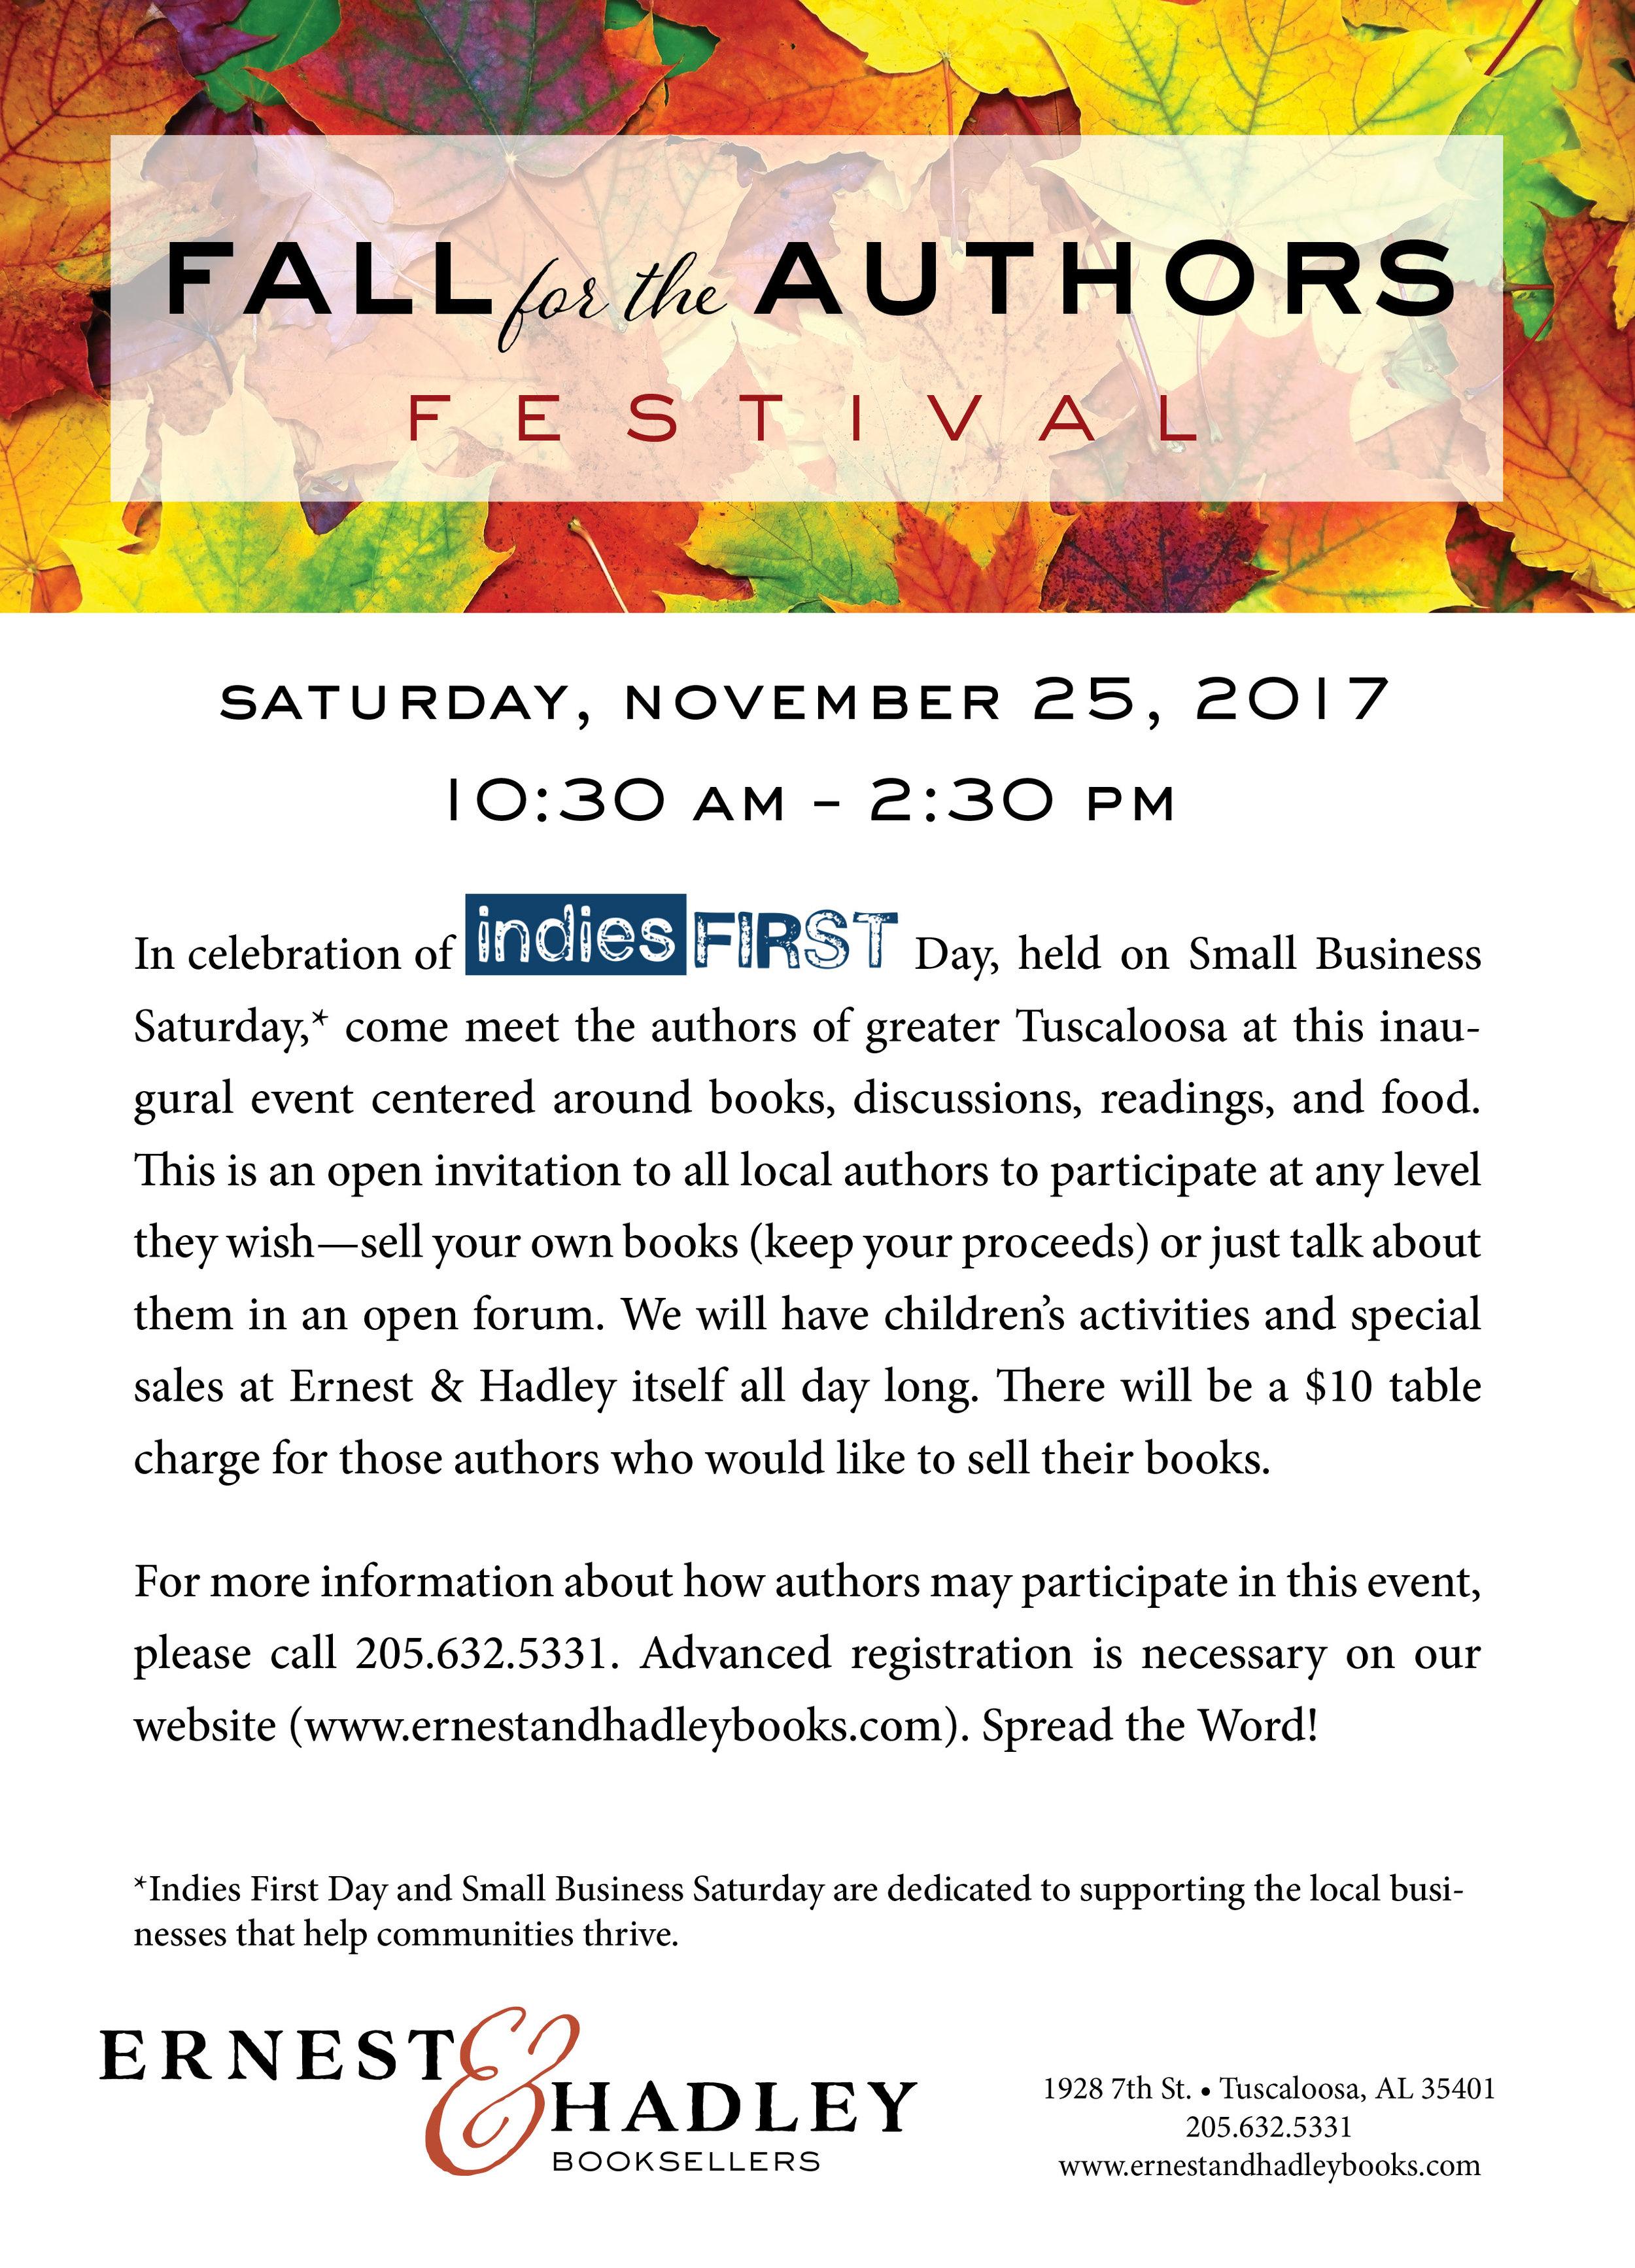 Fall for the Authors Festival.jpg